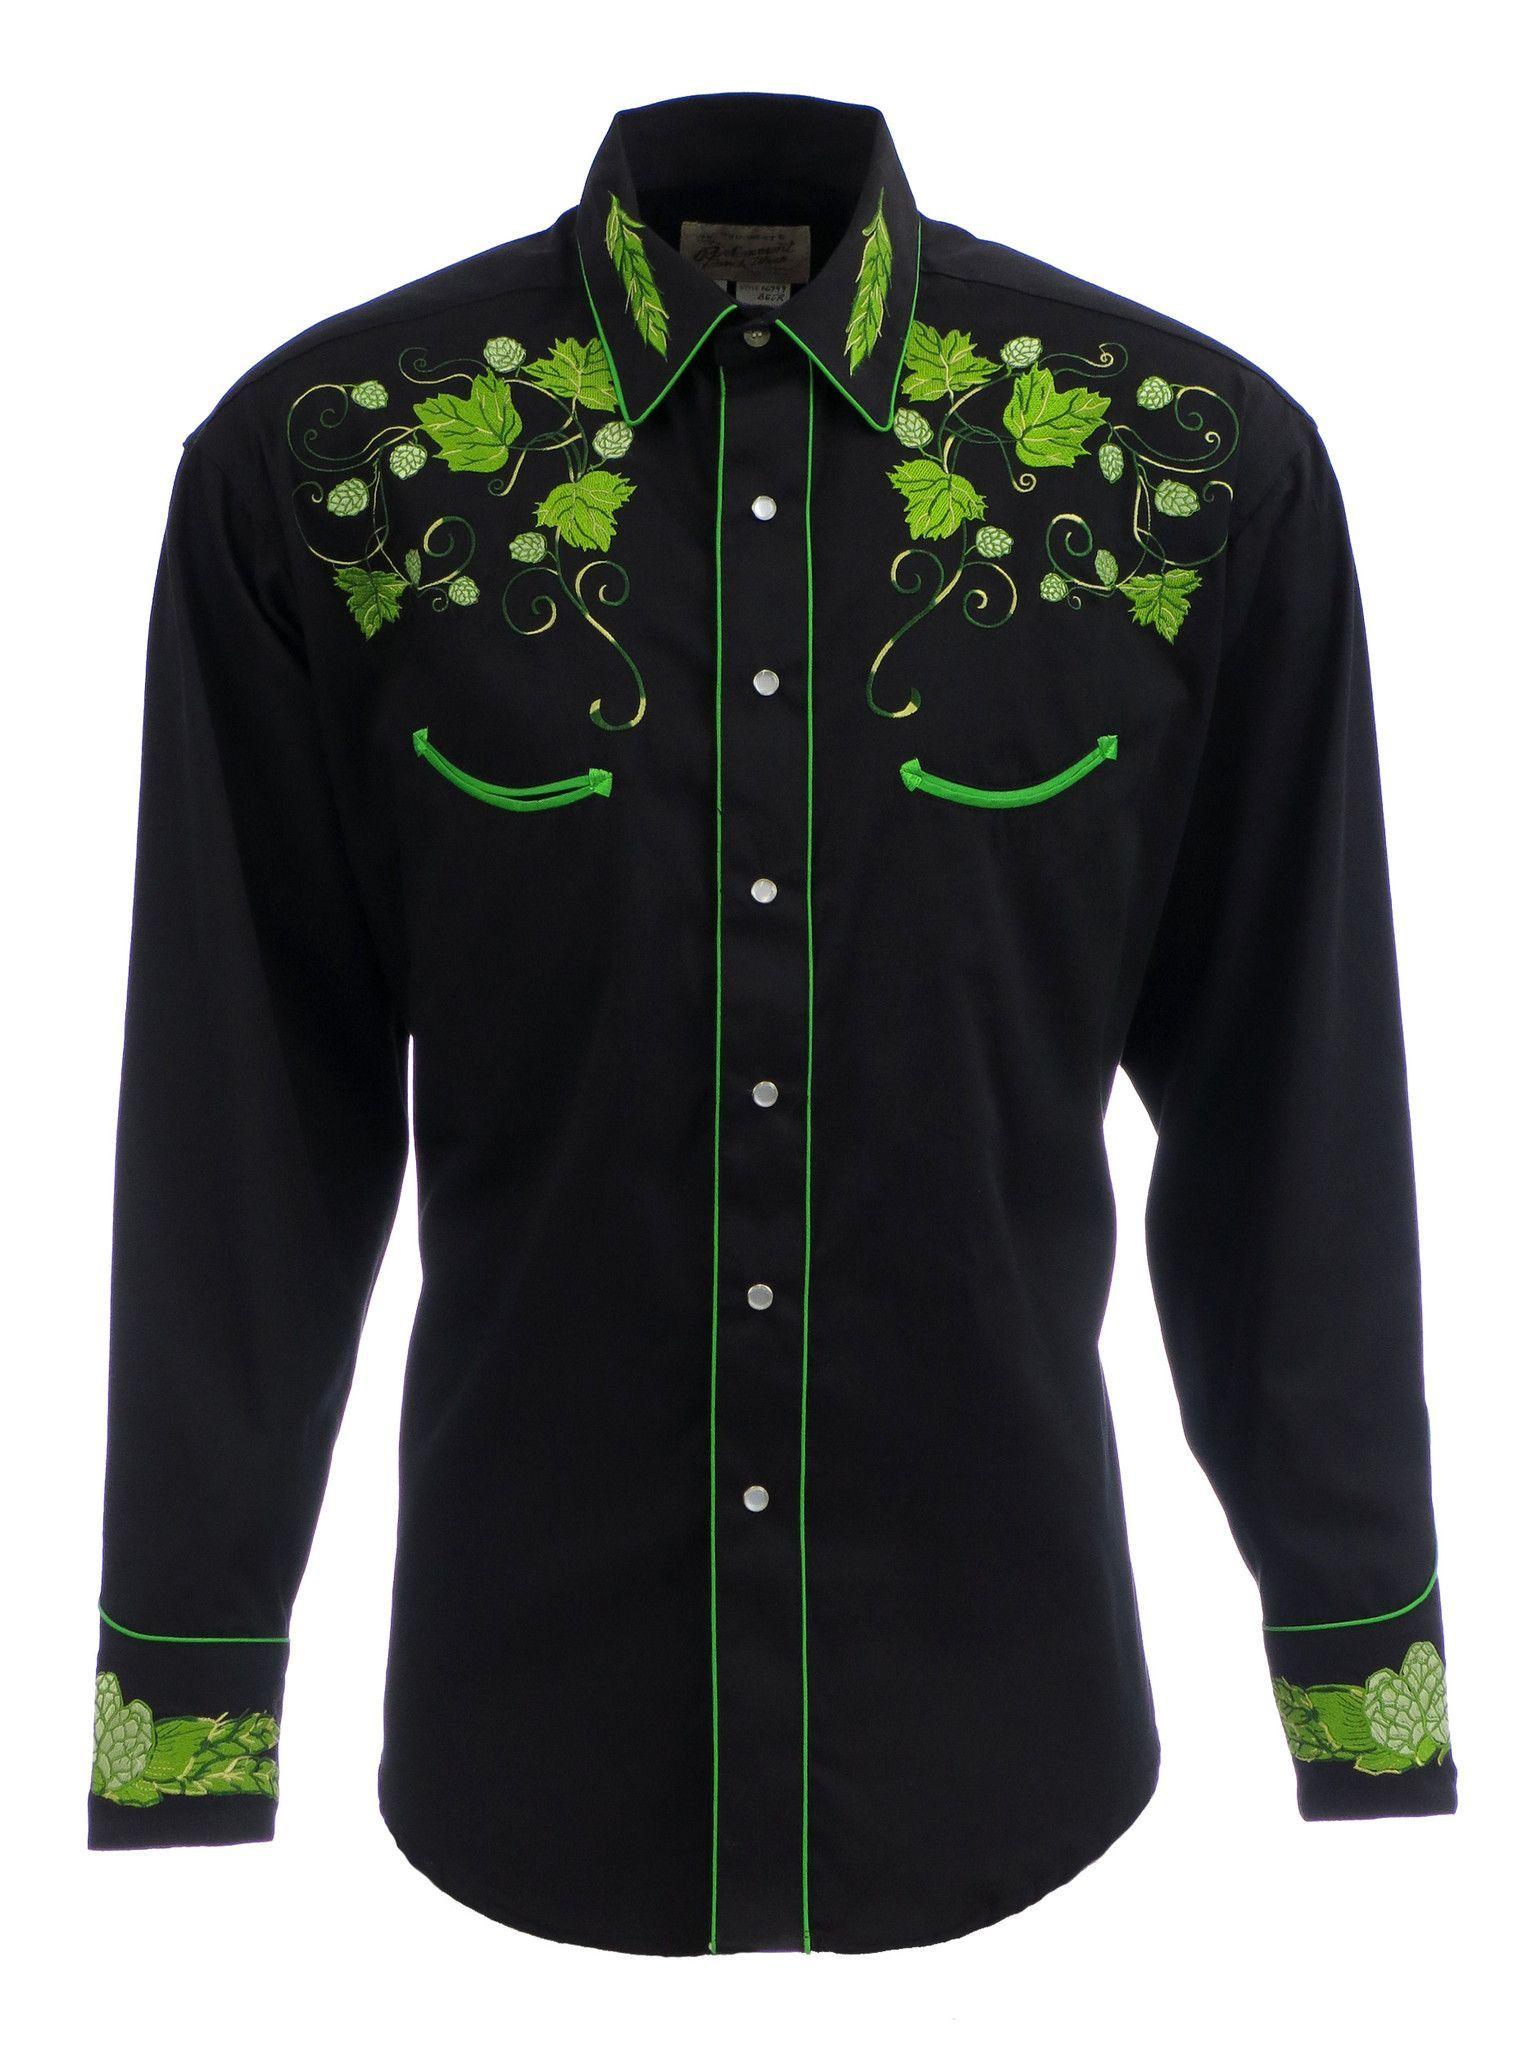 23d9b516 Rockmount Mens Black 100% Cotton L/S Western Shirt Vintage Hops Embroidered